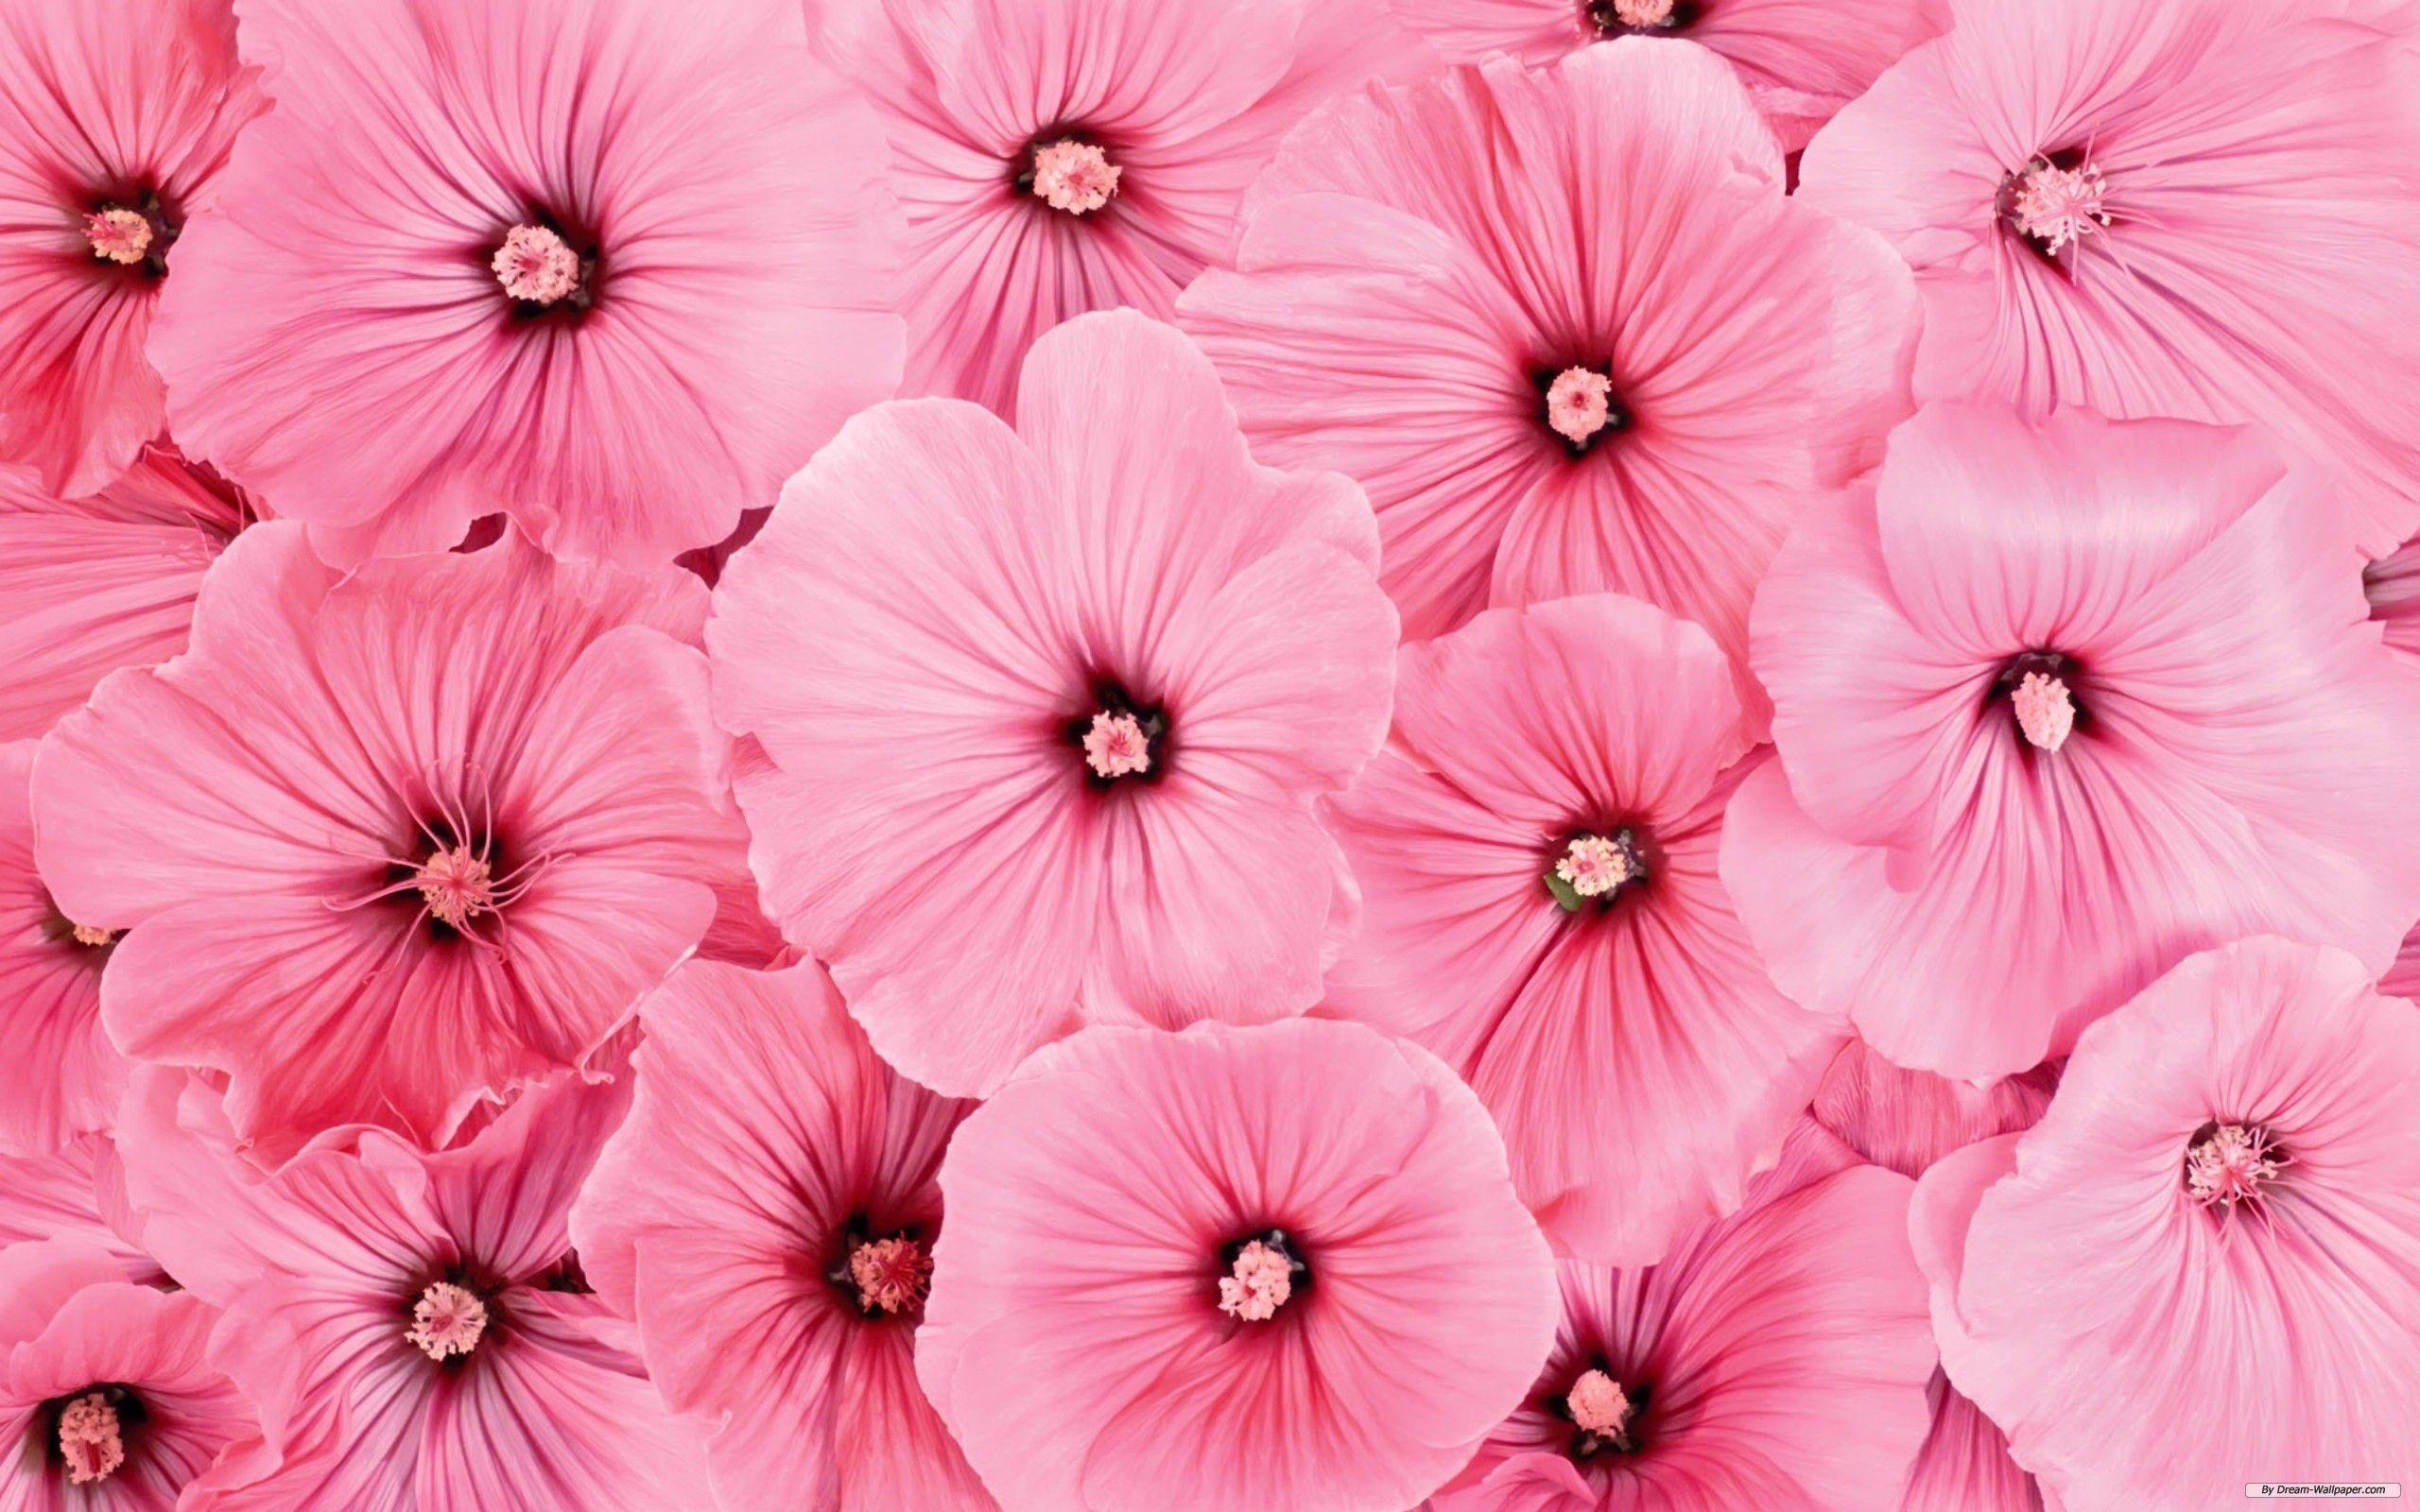 Pink Flower Wallpapers Full Hd Wallpaper Search